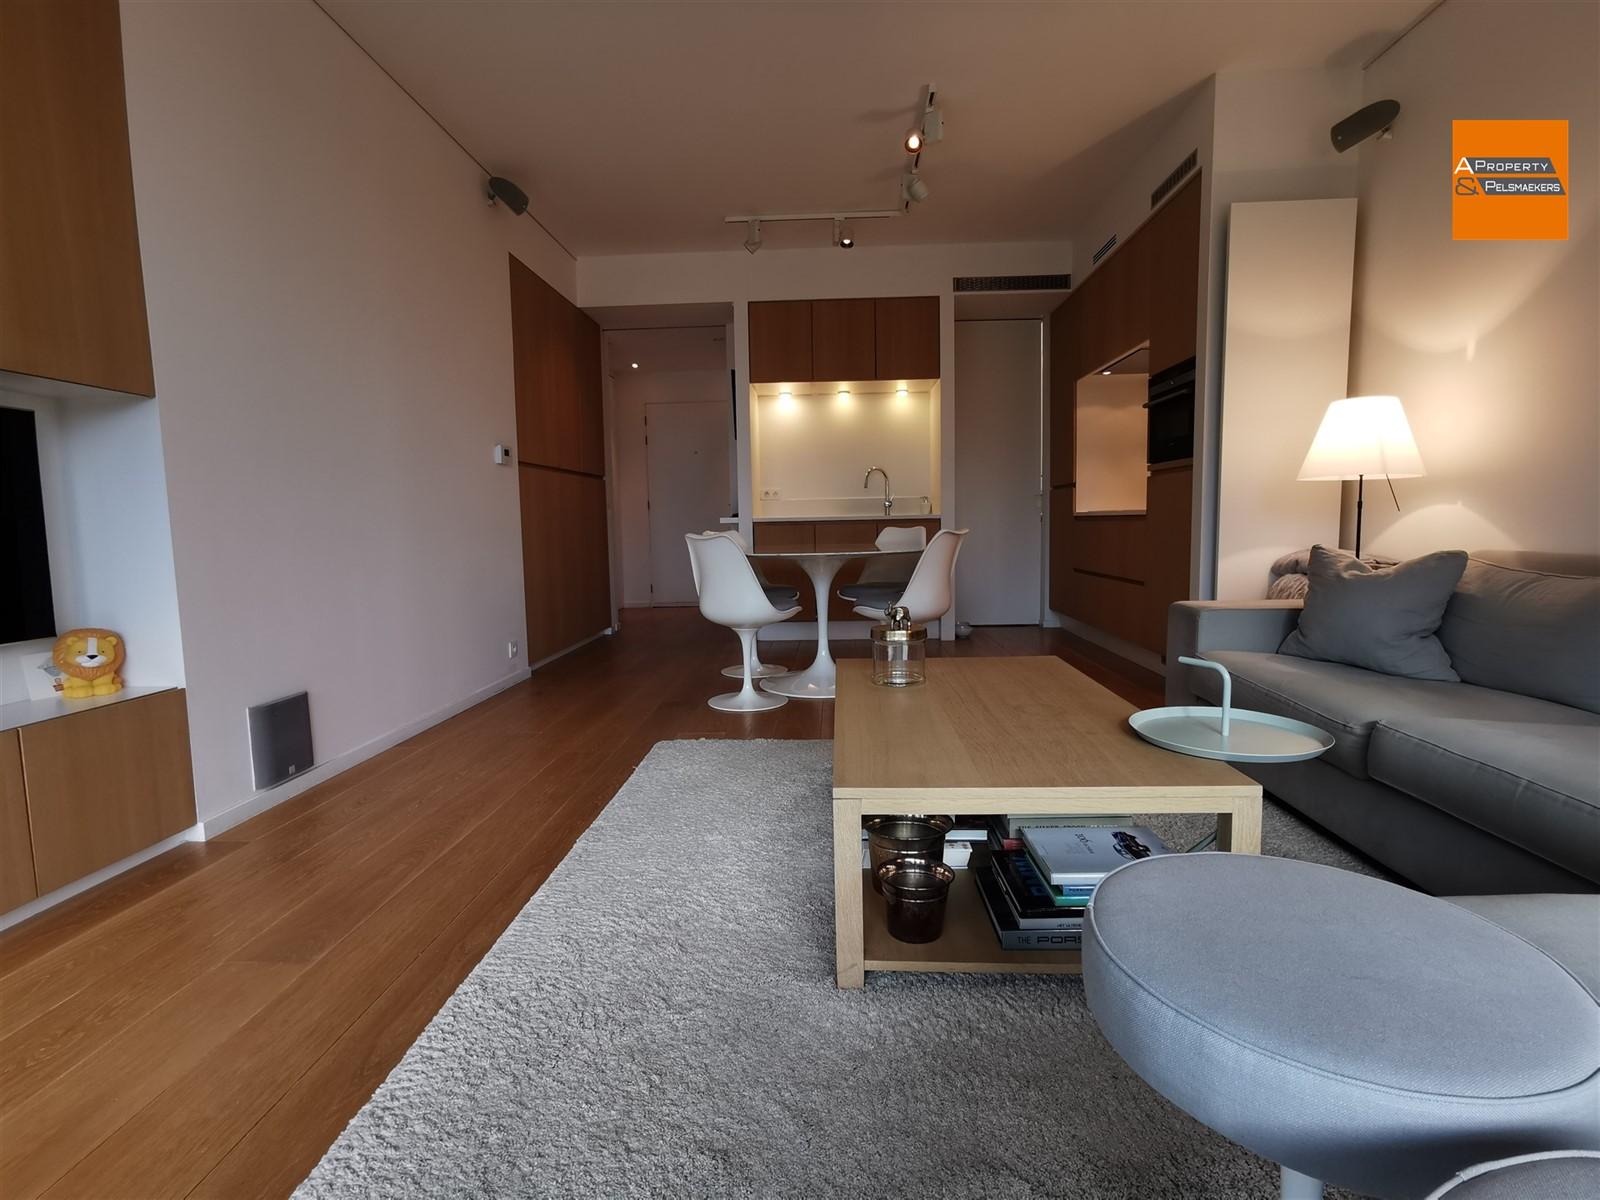 Foto 2 : Gemeubeld appartement in 1050 ELSENE (België) - Prijs € 1.500